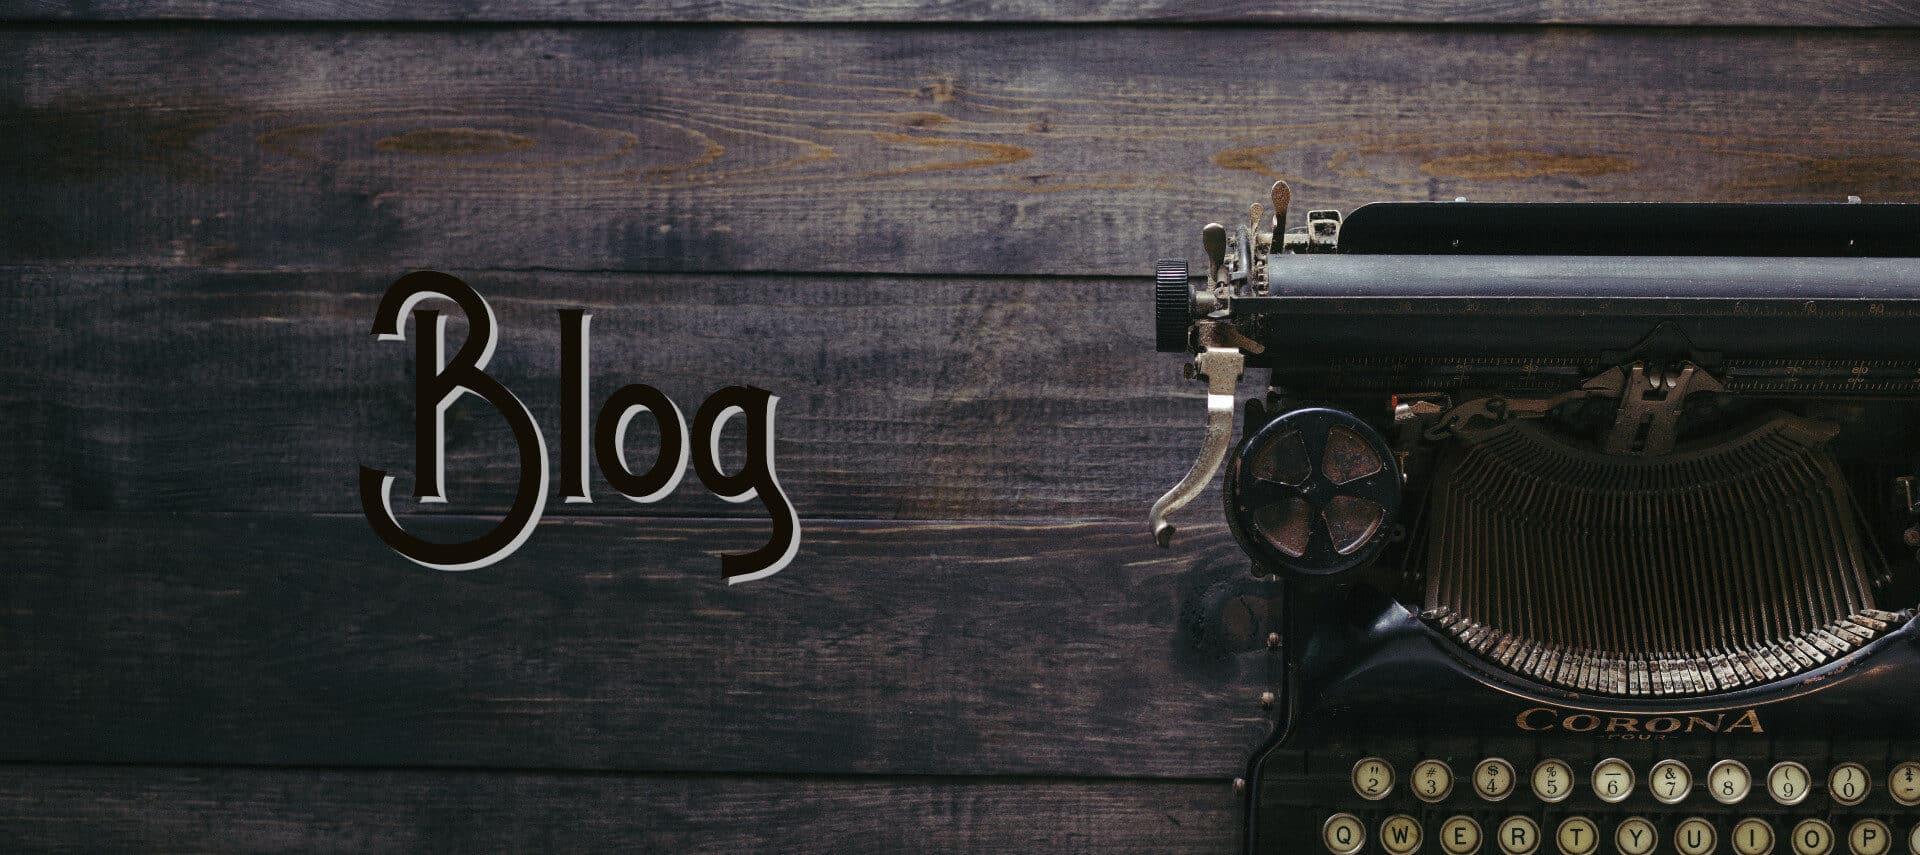 A black antique typewriter sitting on weathered wood planks